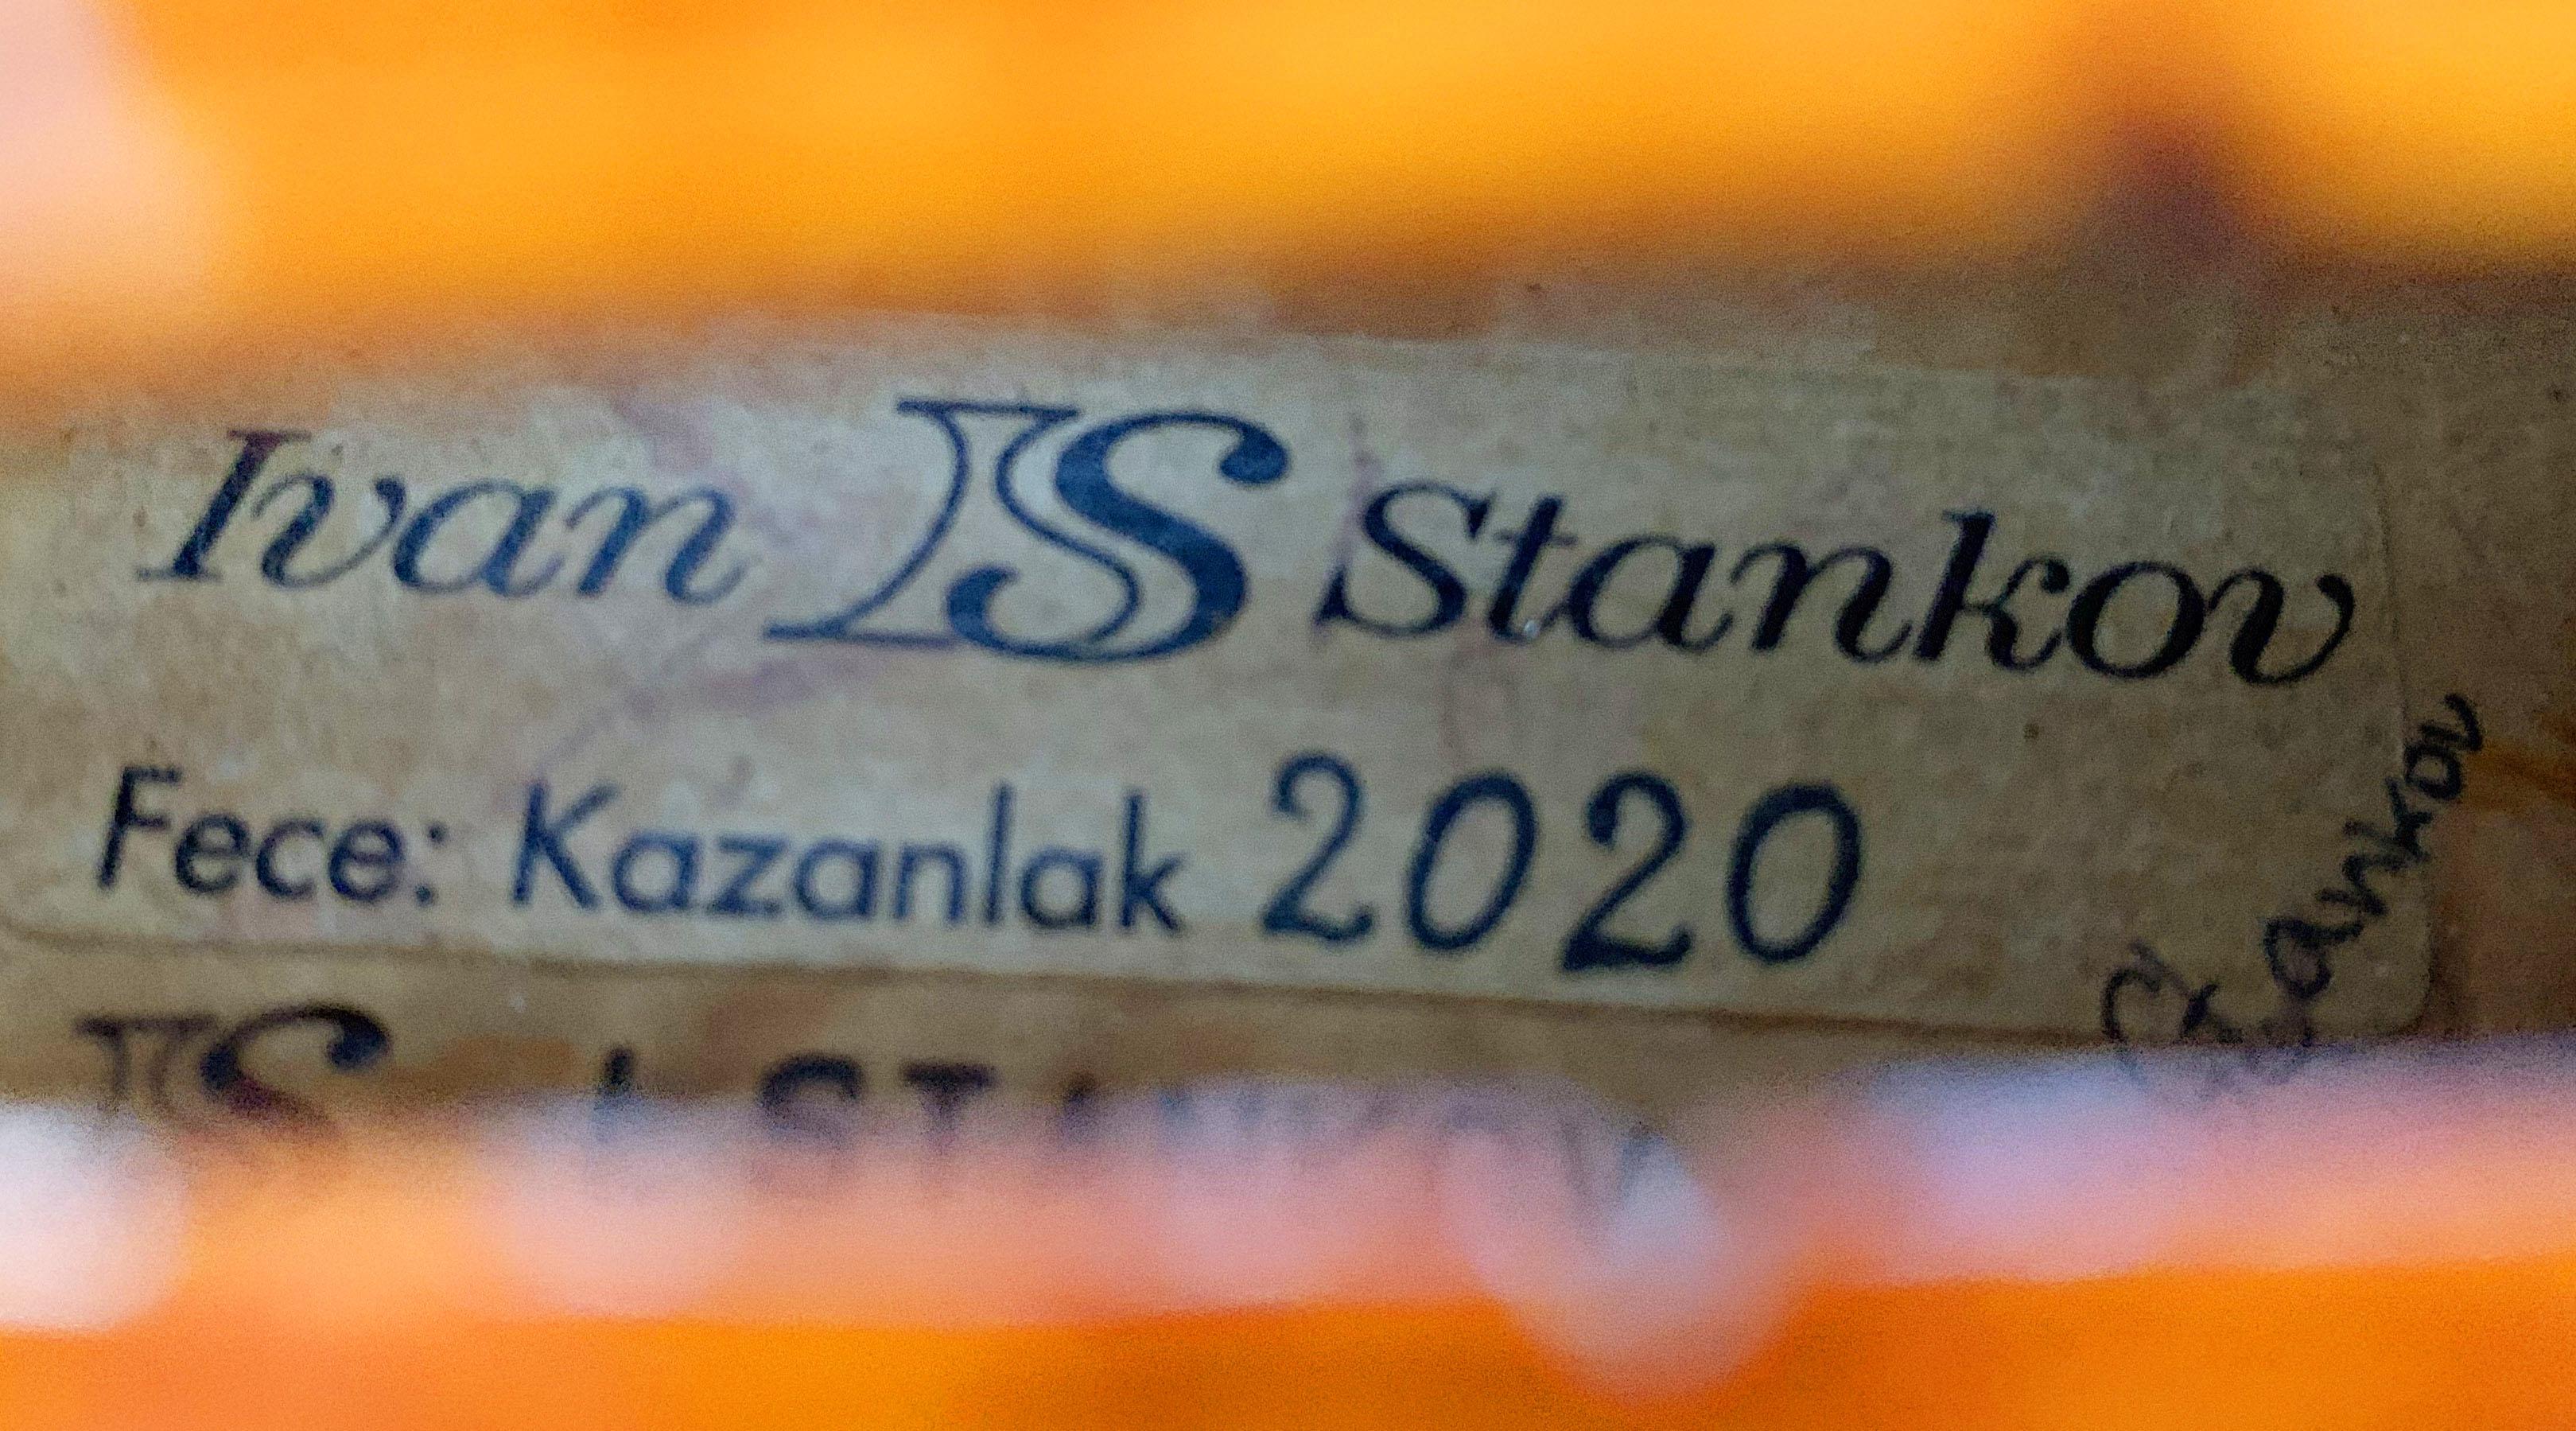 Ivan Stankov Violins